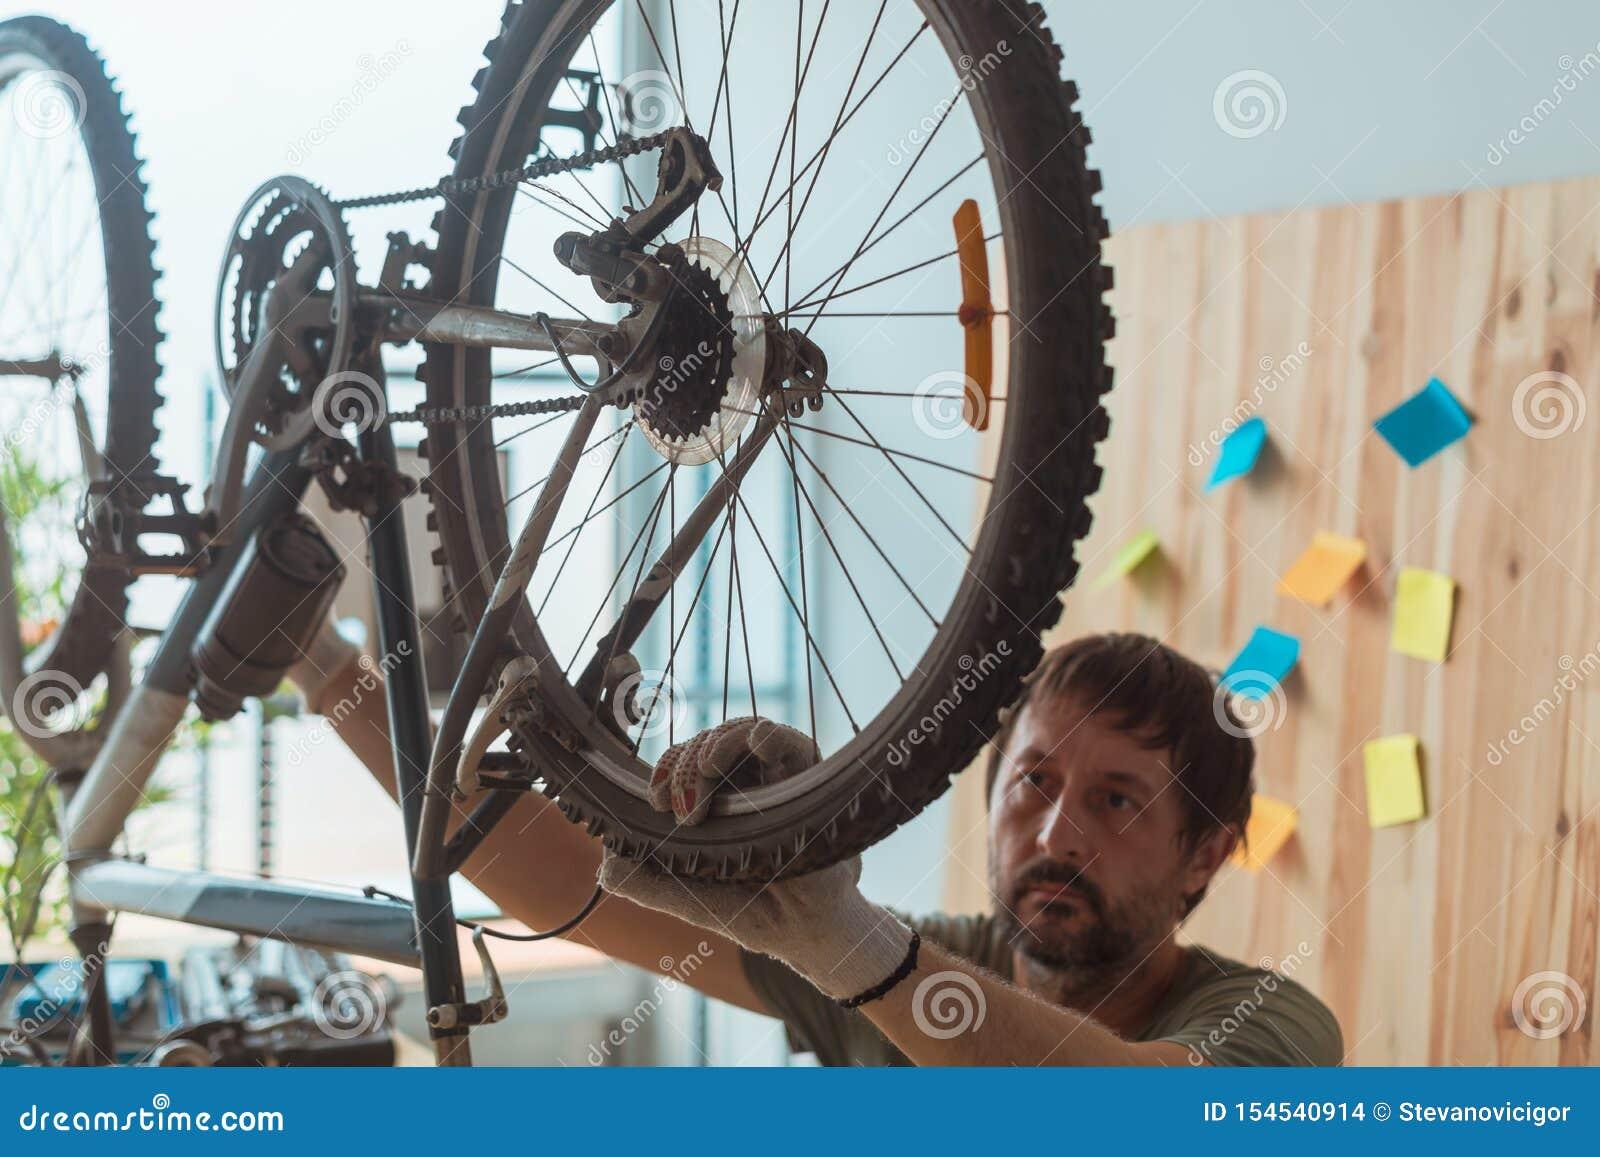 Uomo che ripara vecchio mountain bike in officina